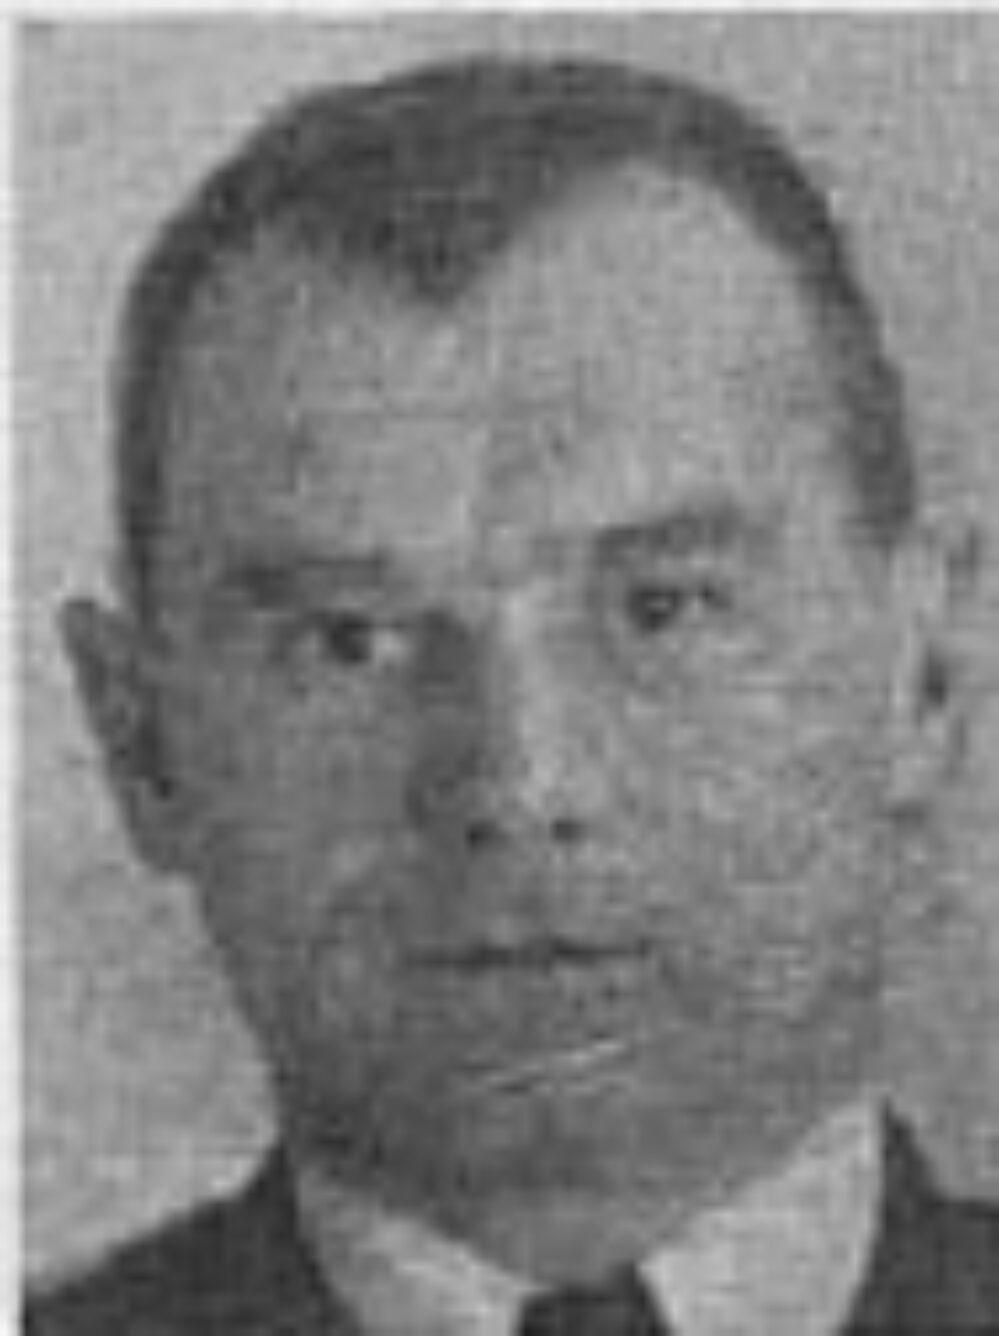 Ludvig Ingebret Waage